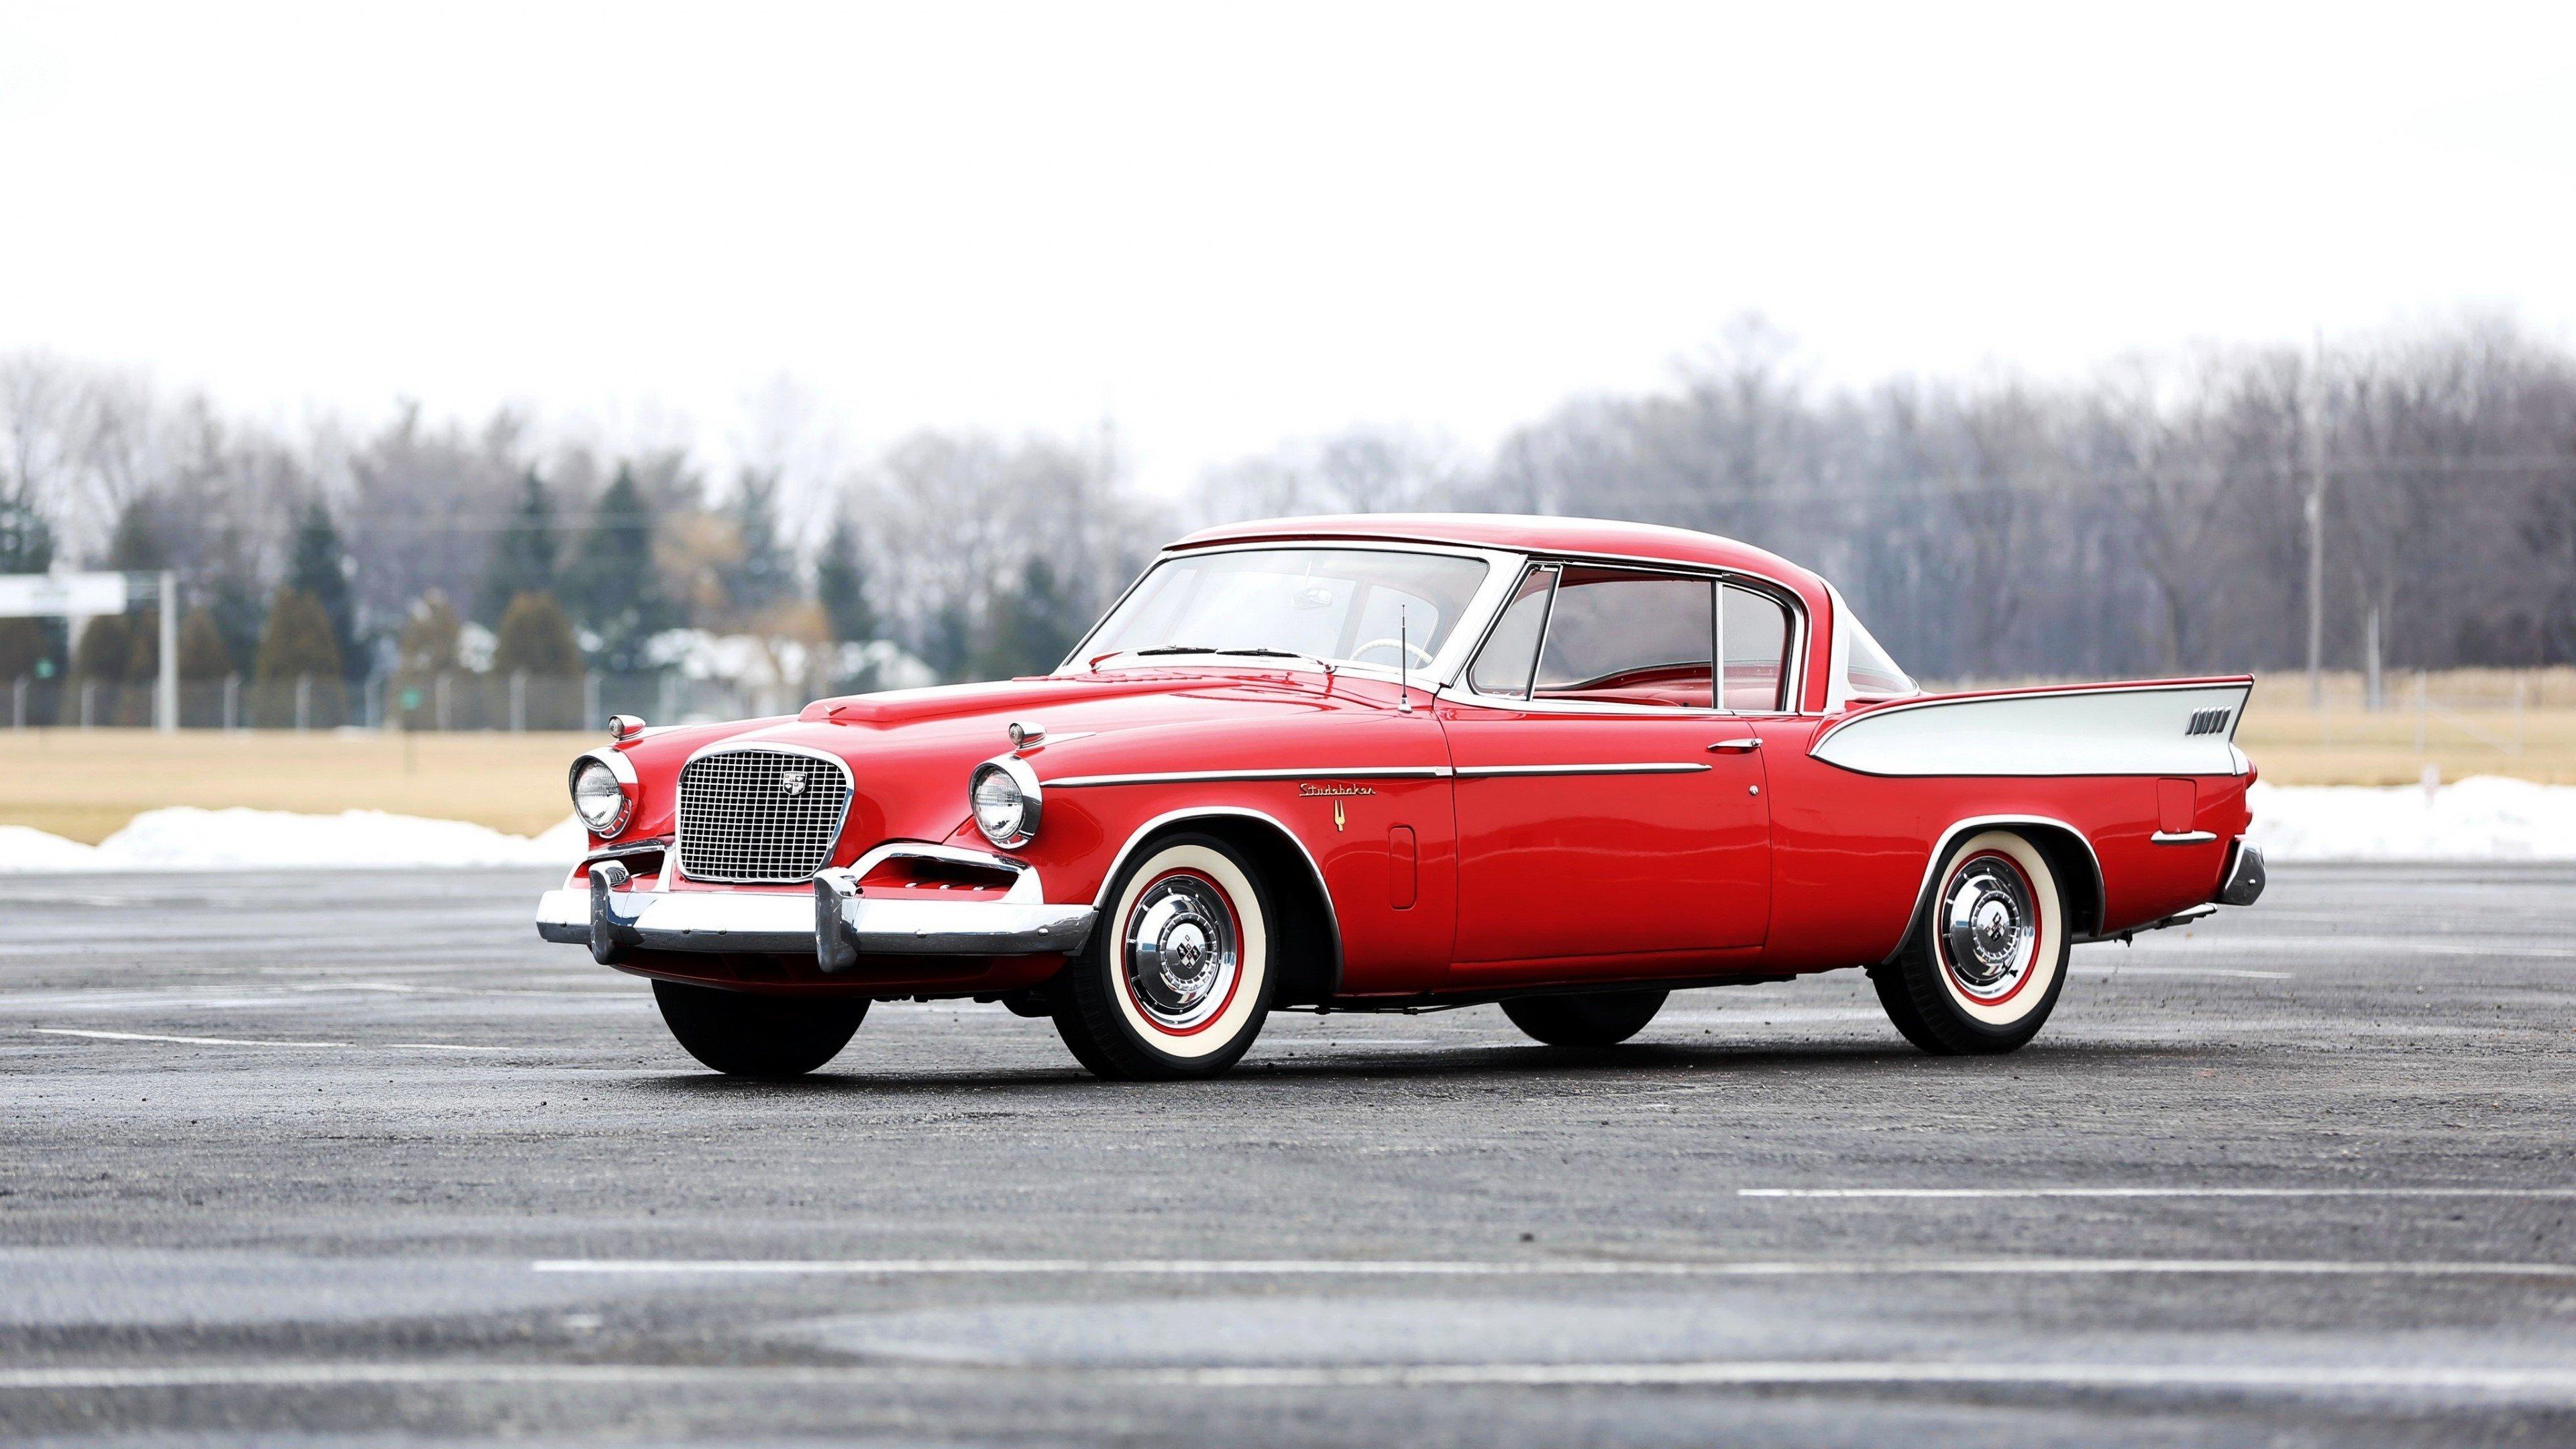 Wallpaper Studebaker Golden Hawk 1957 red